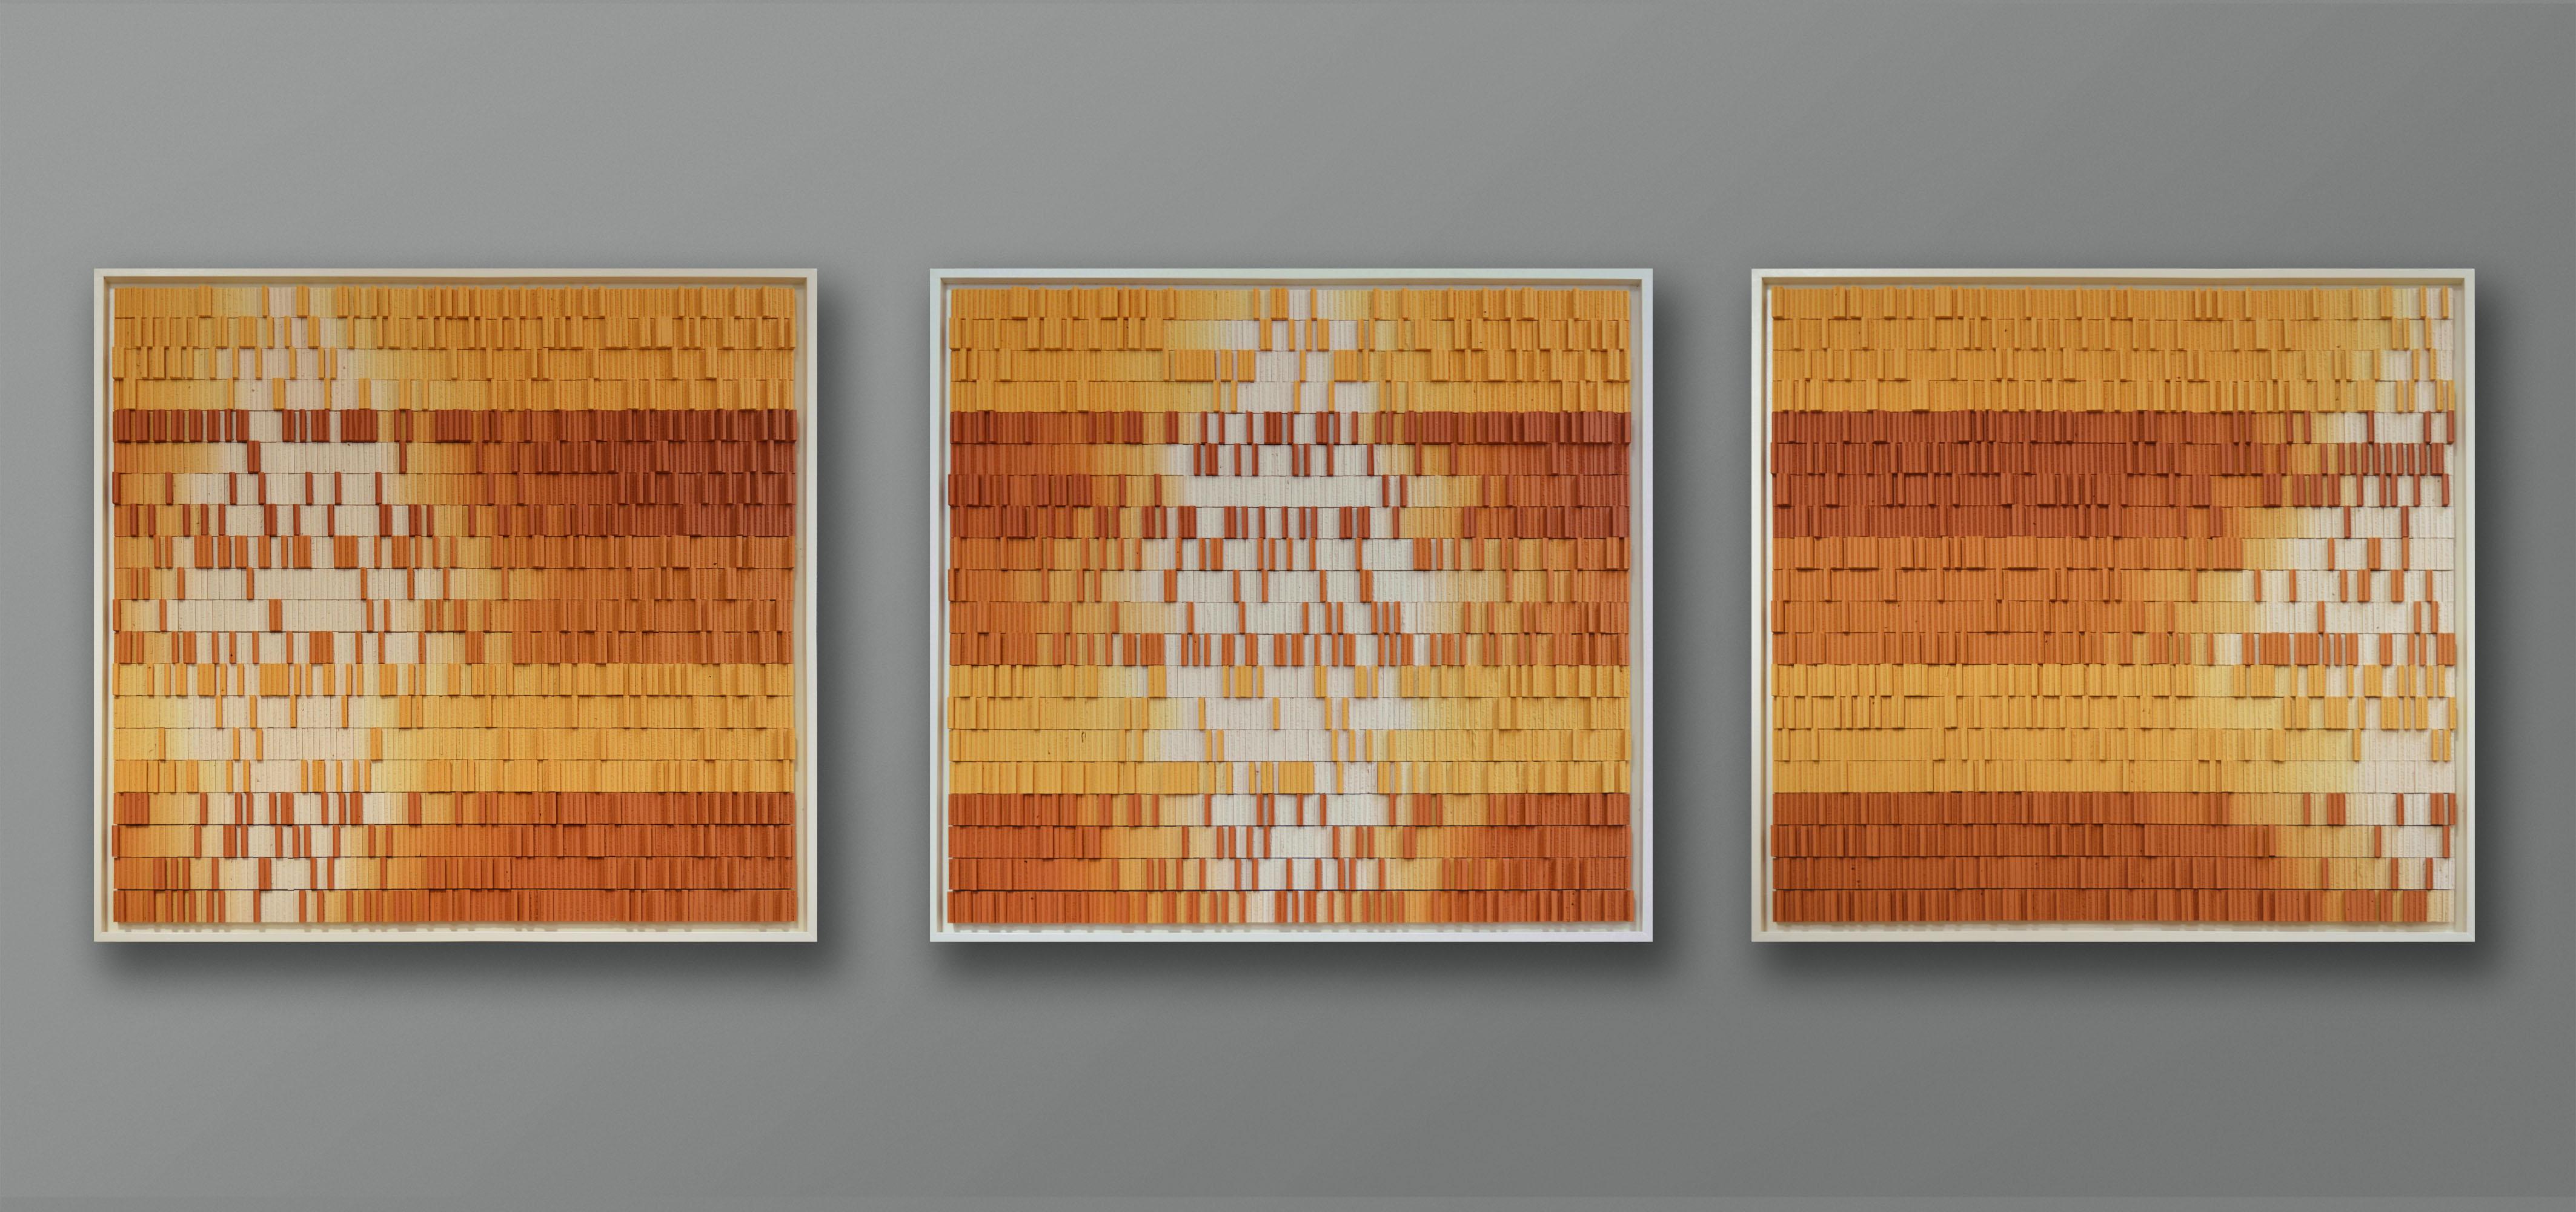 New Work at New Art Centre - Jacob Van Der Beugel